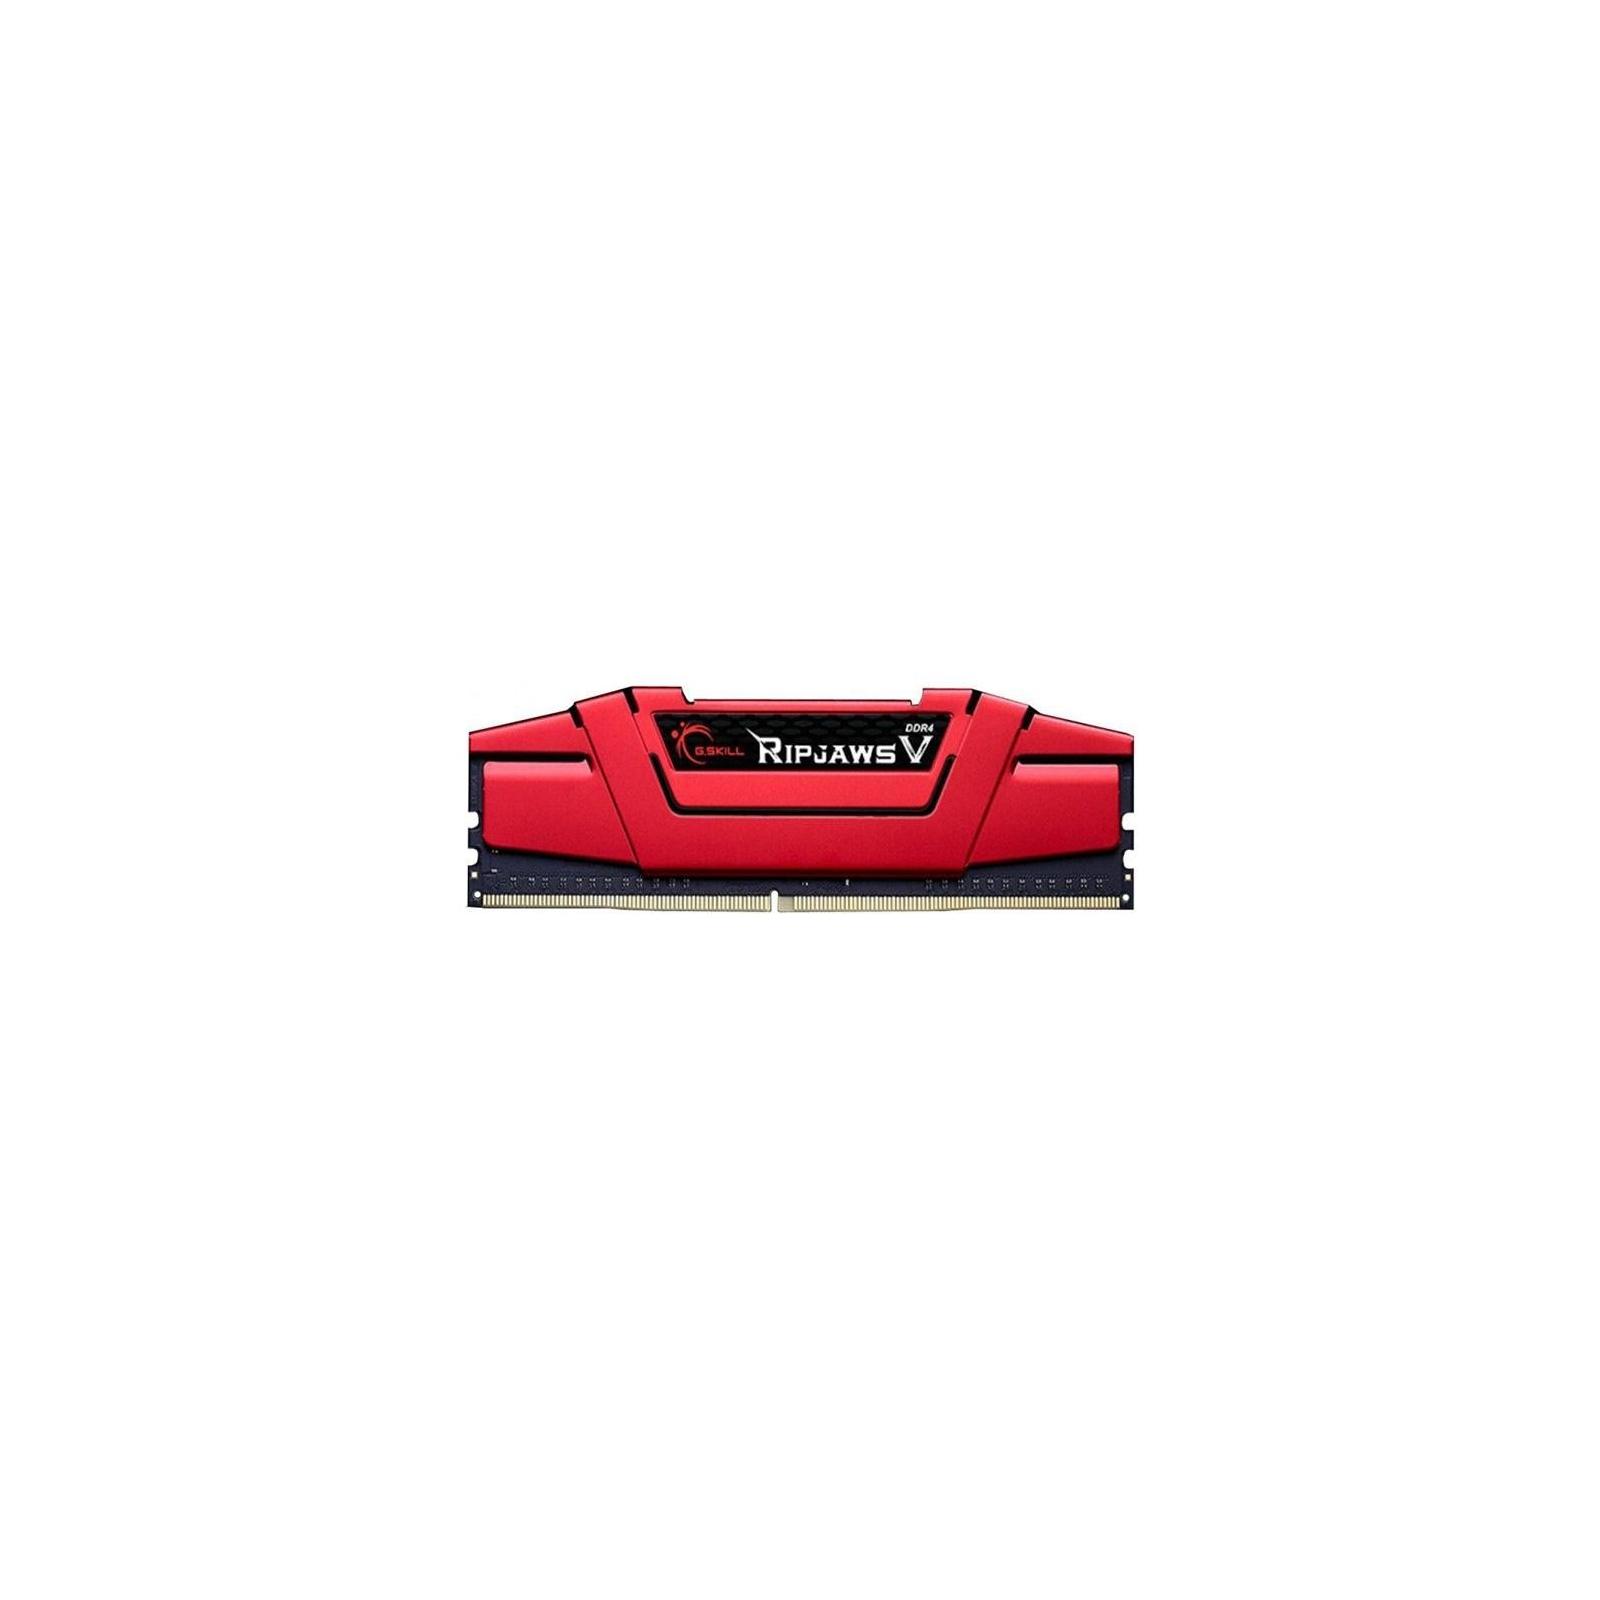 Модуль памяти для компьютера DDR4 16GB 3000 MHz RipjawsV G.Skill (F4-3000C15S-16GVR)